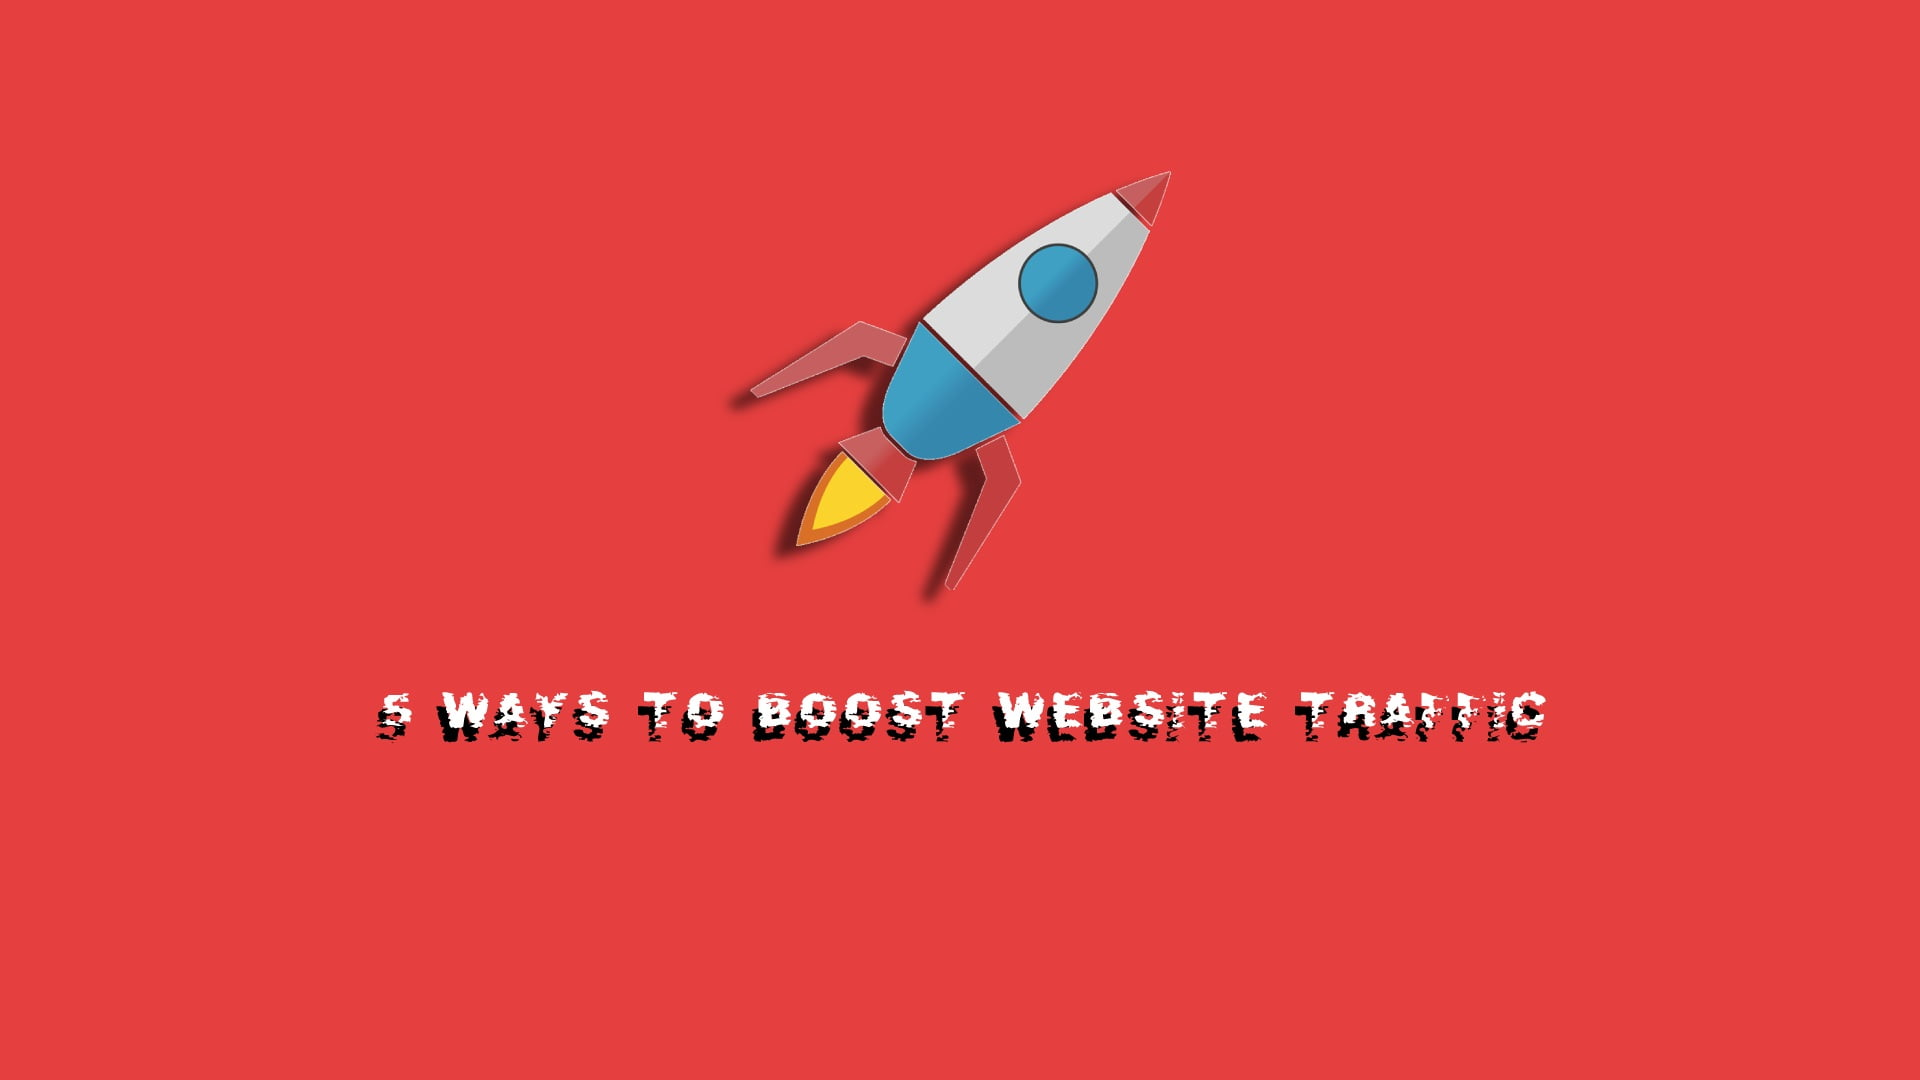 5 Ways To Boost Website Traffic